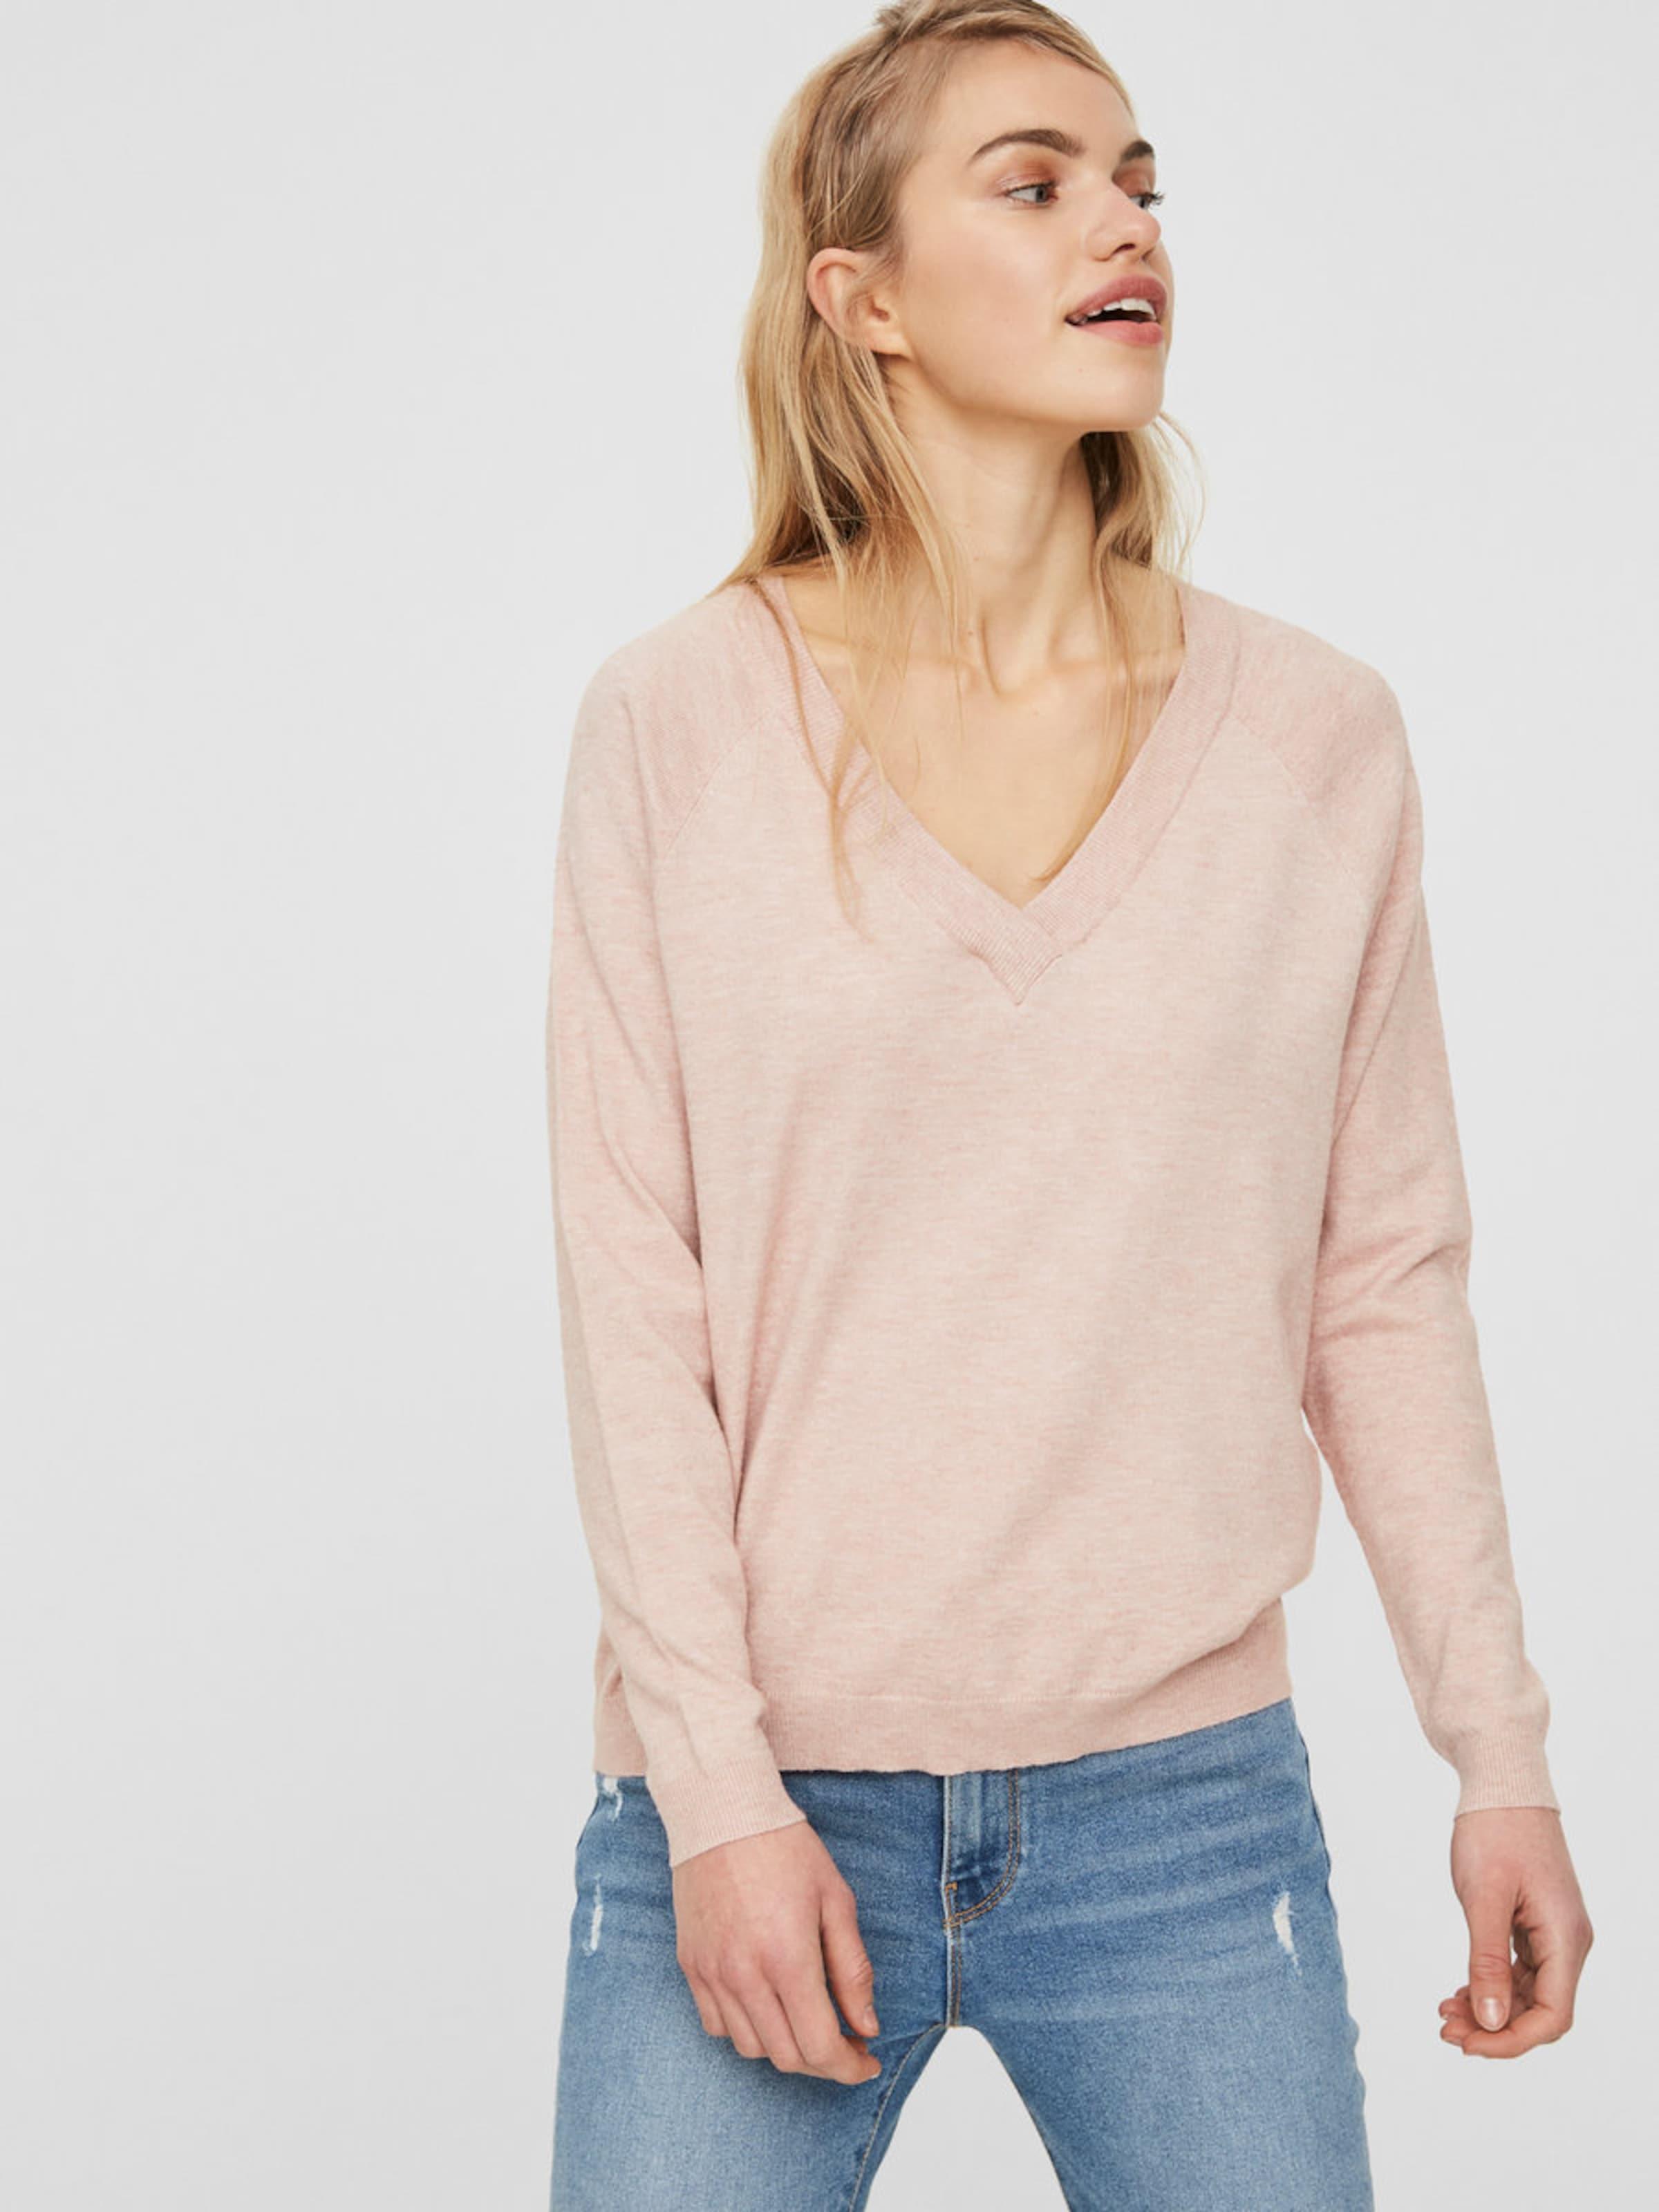 VERO MODA leichter Pullover Manchester Große Online-Verkauf O8bNpwCF